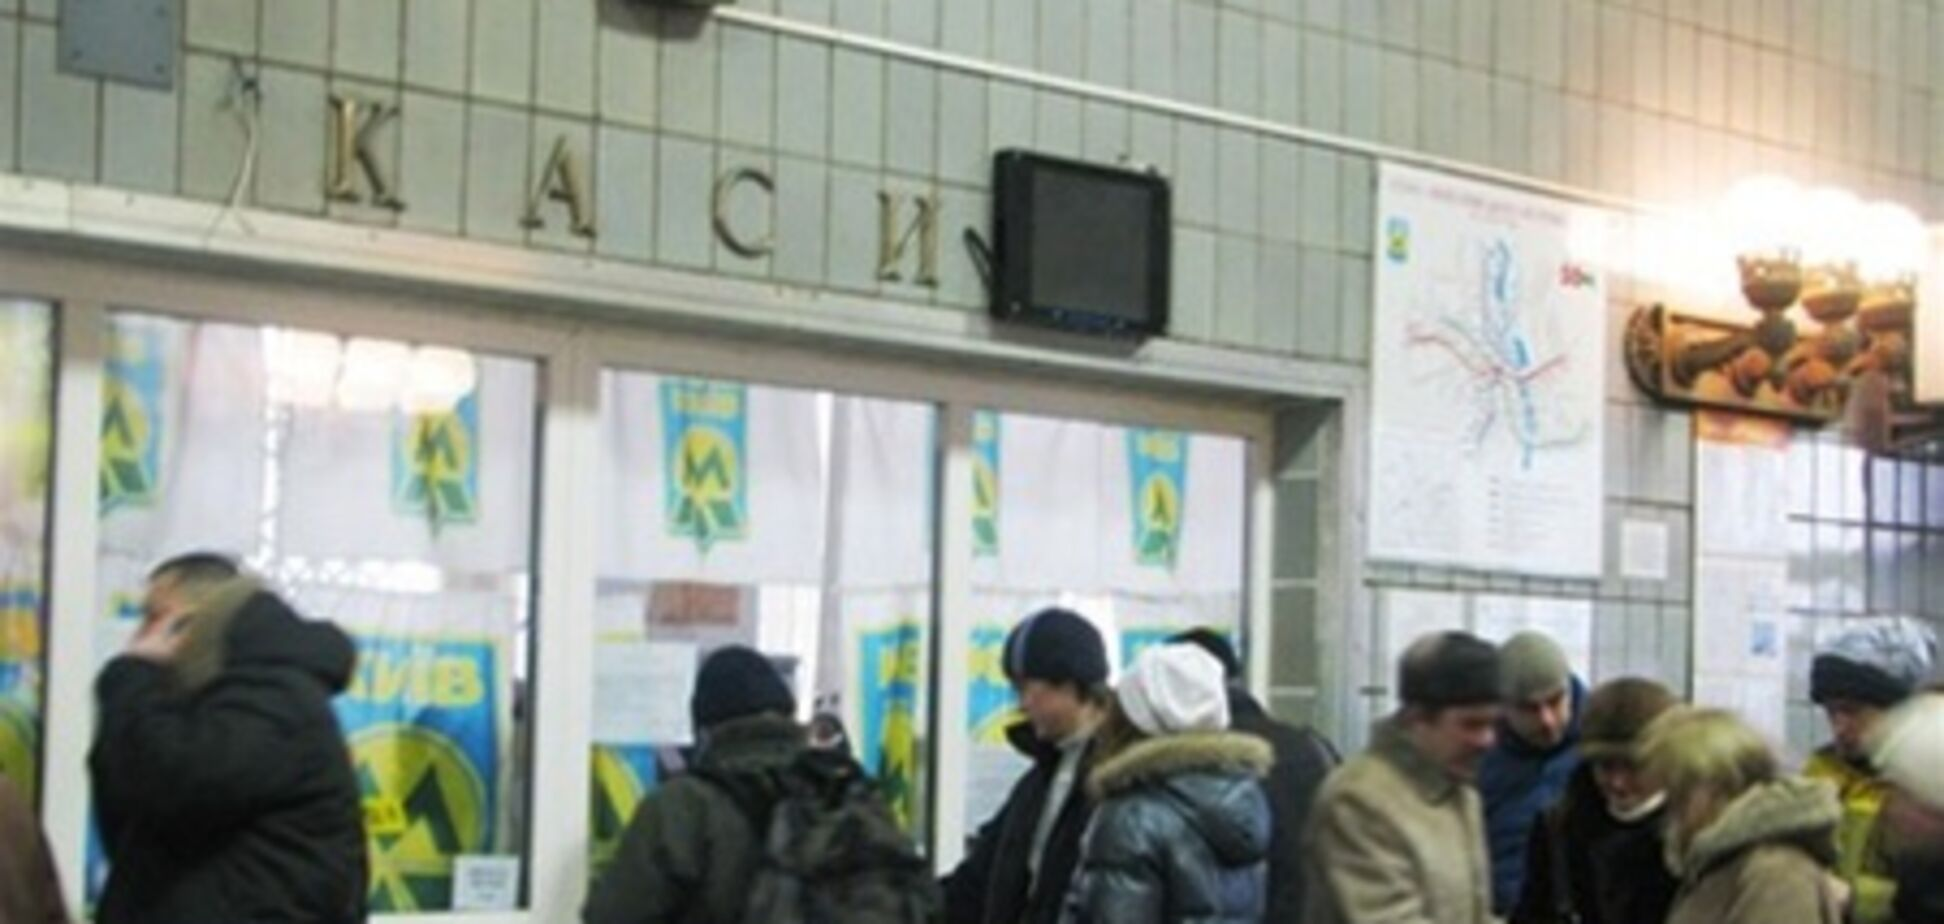 Работники метро 'заработали' на пассажирах миллион